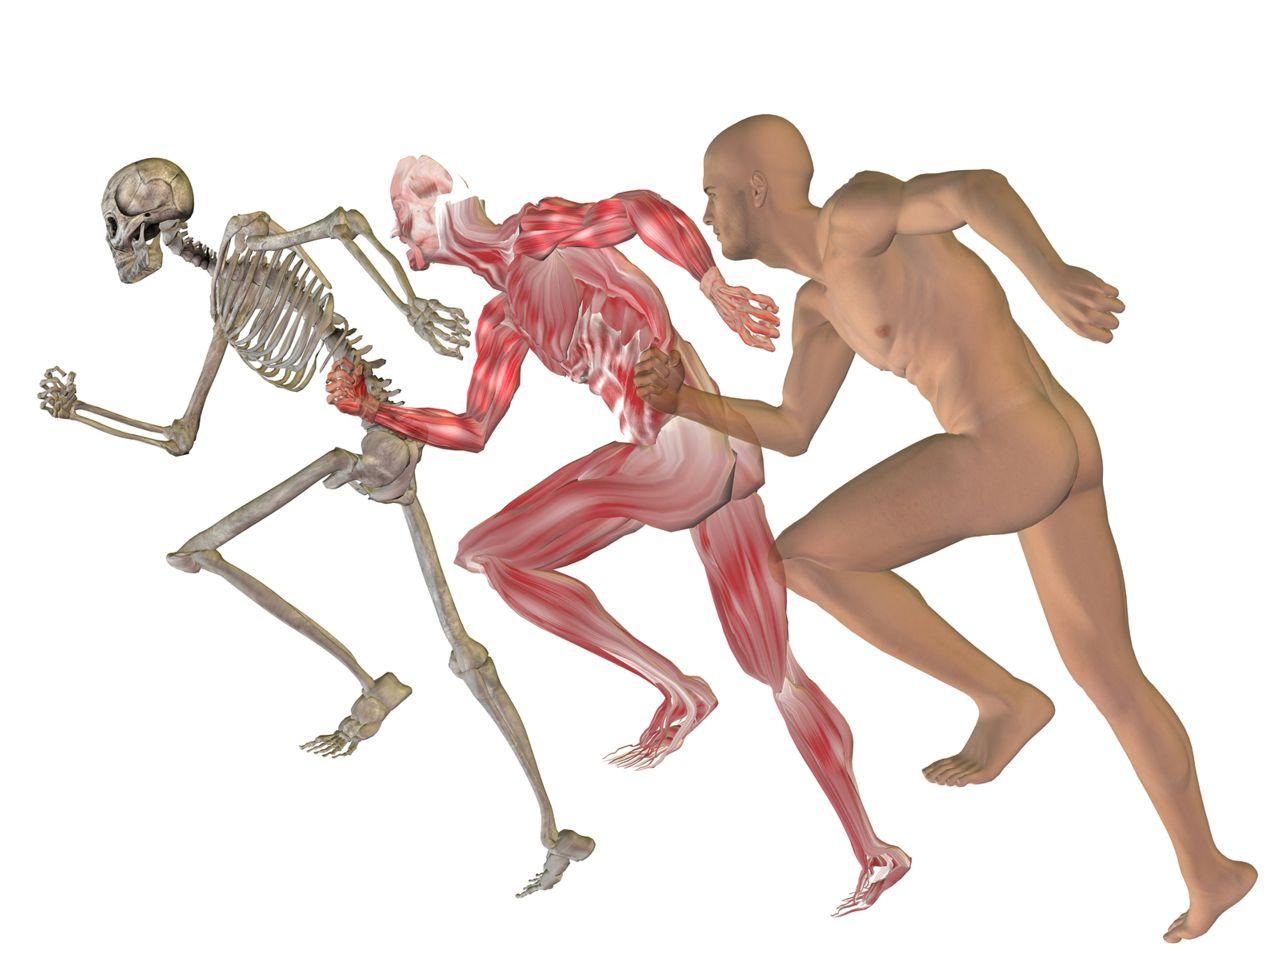 Treating Painful Bursitis